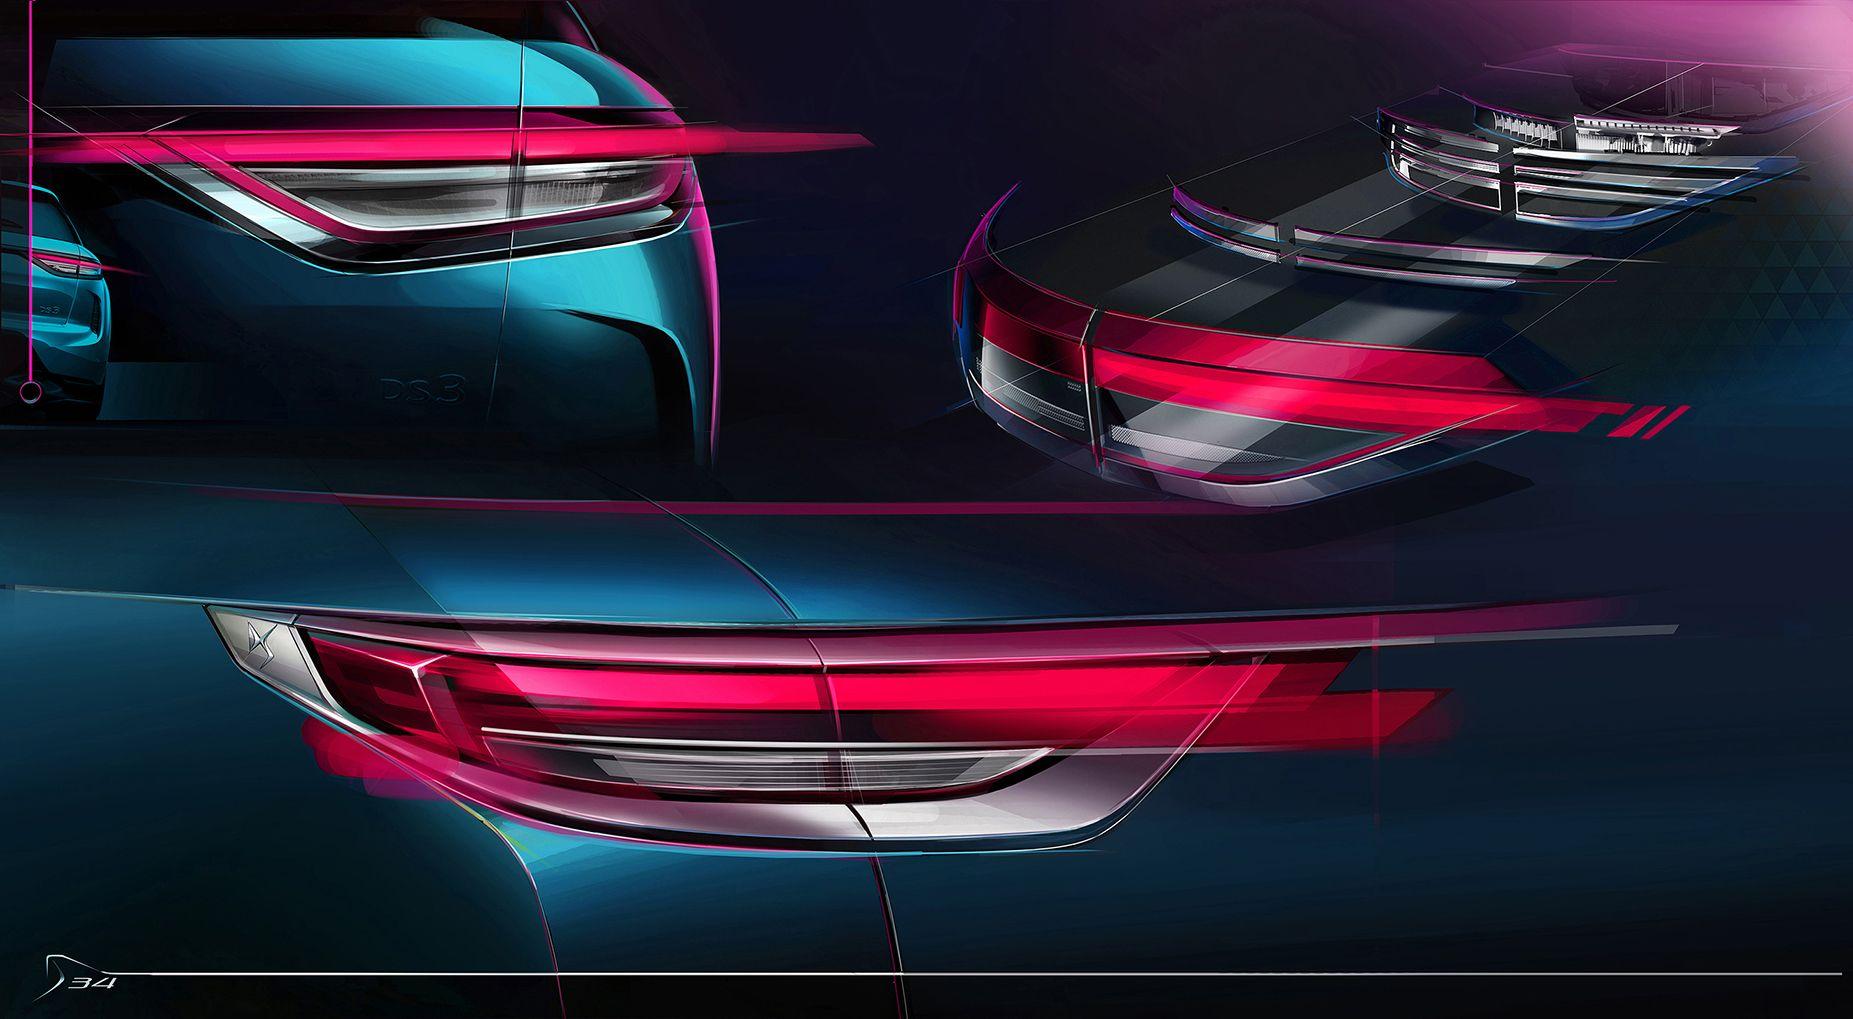 2019 ds3 crossback tail light design